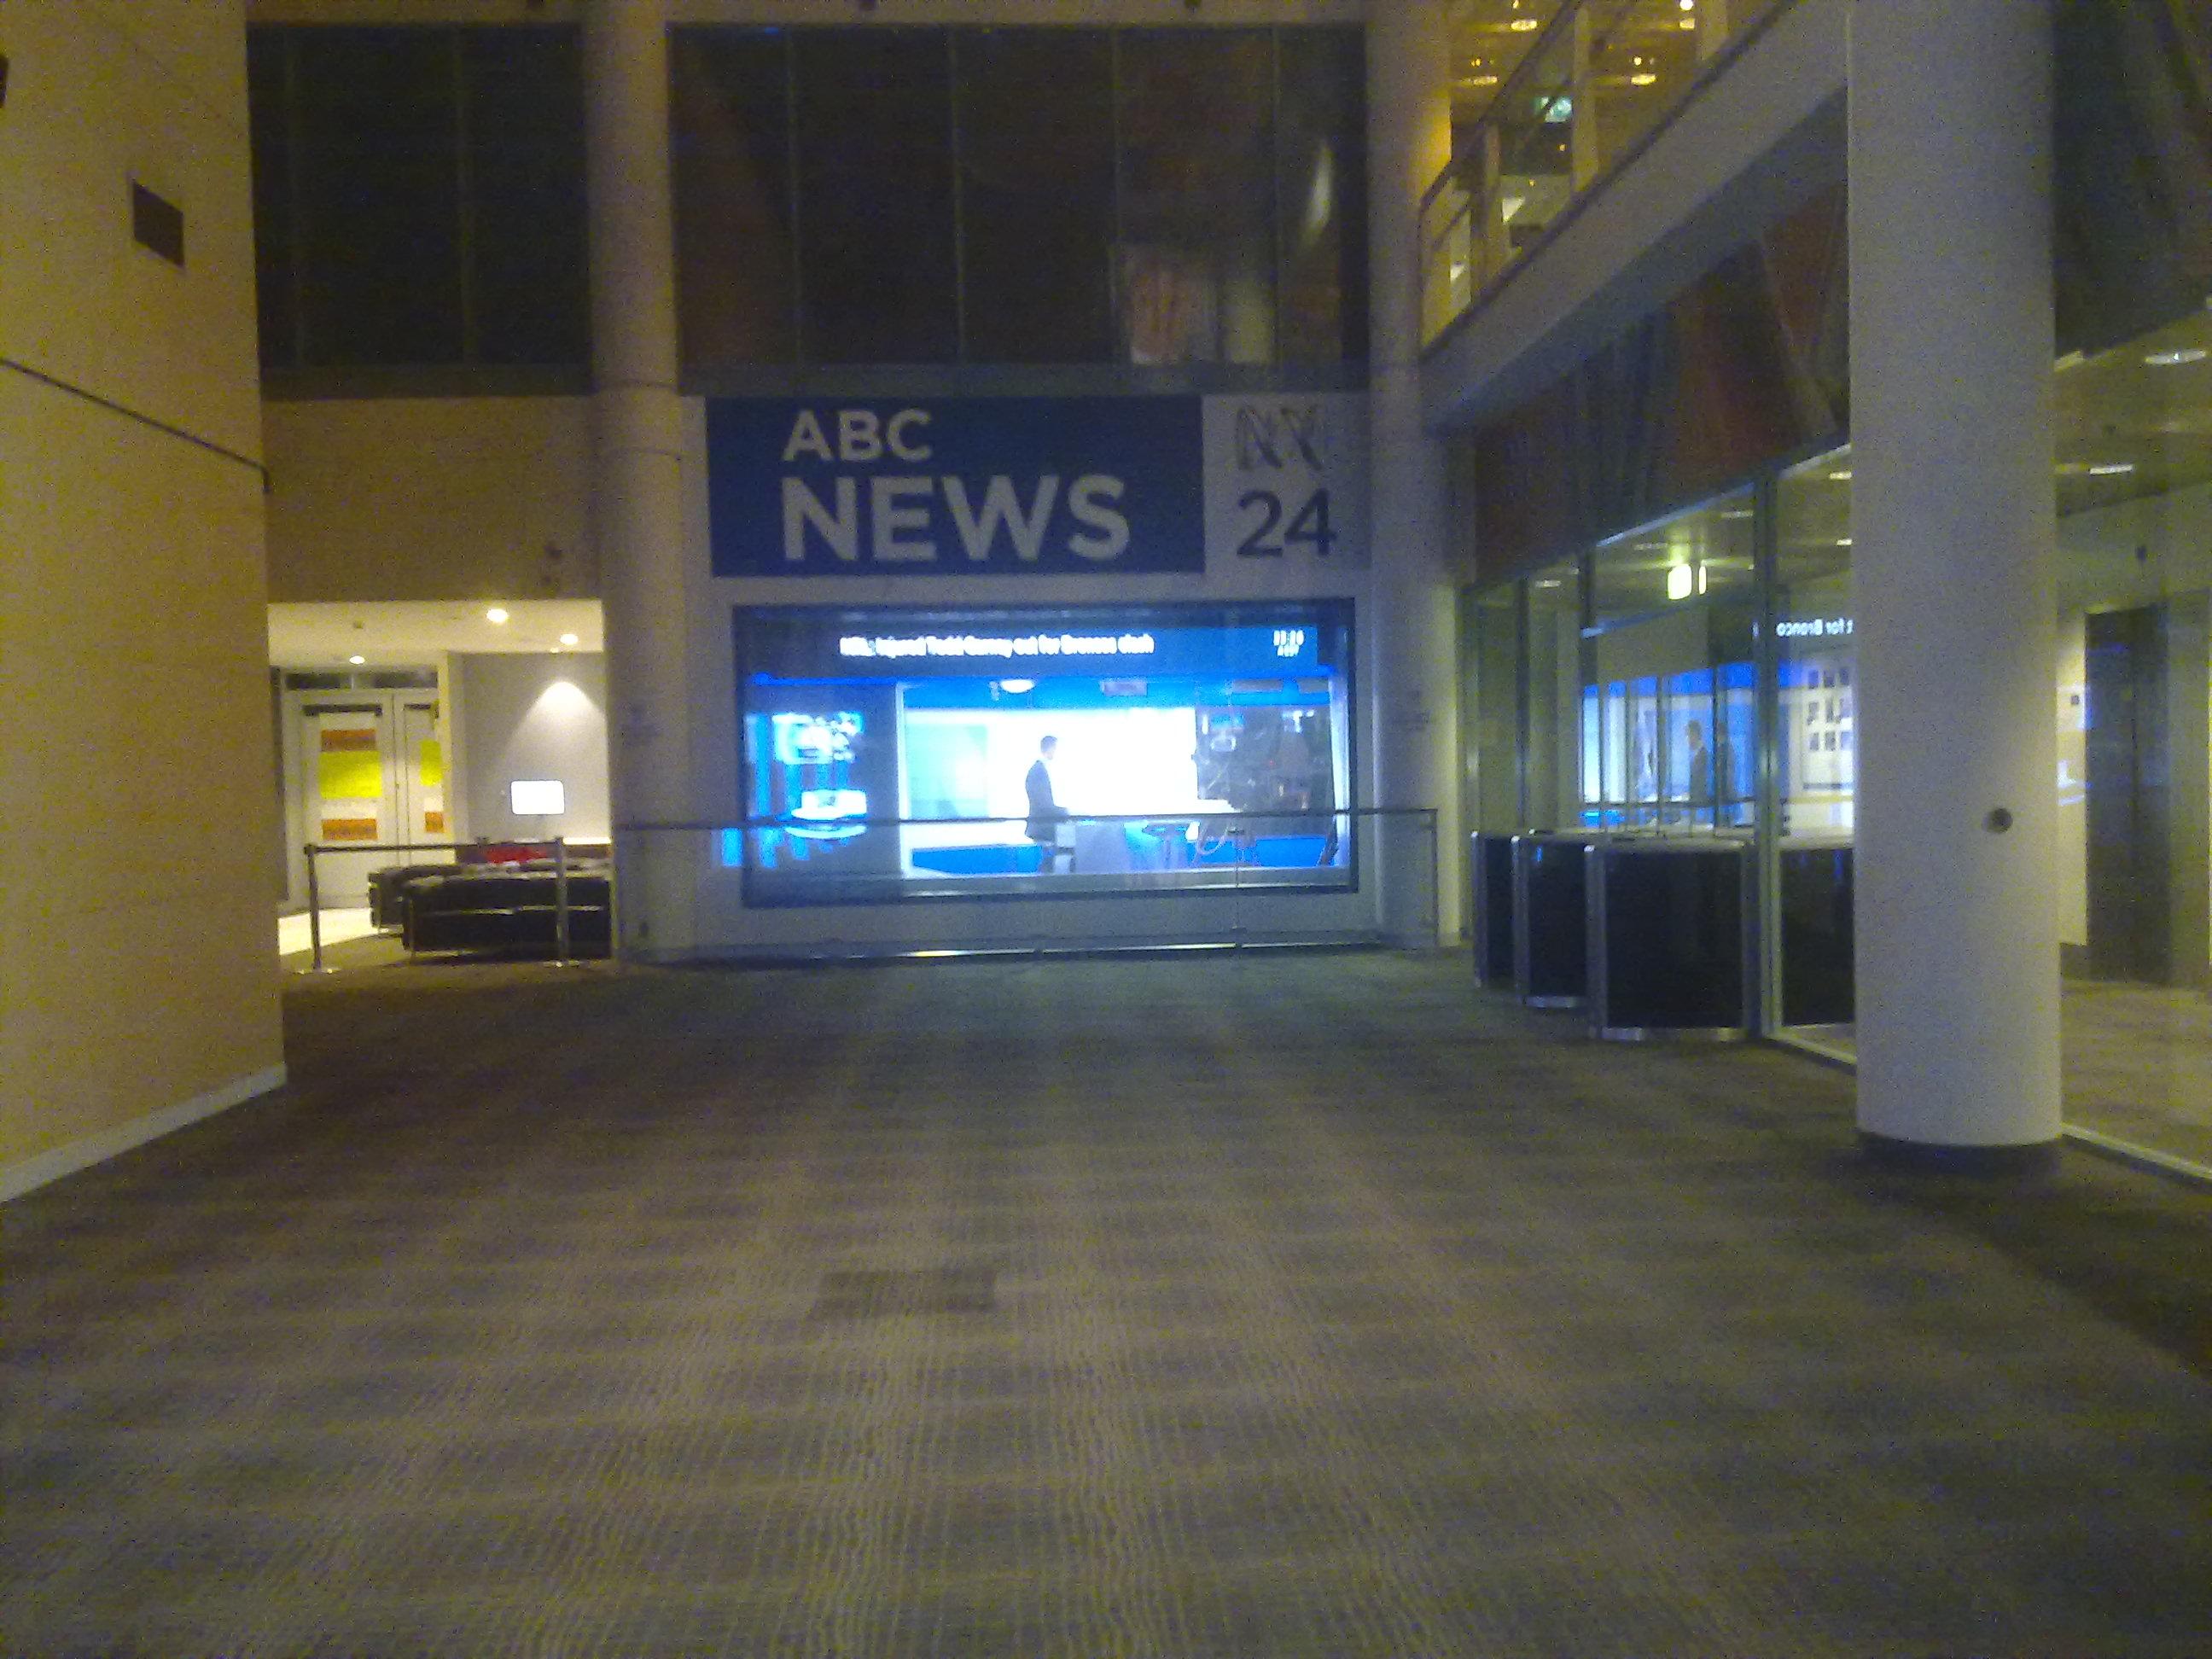 ABC News 24 at night